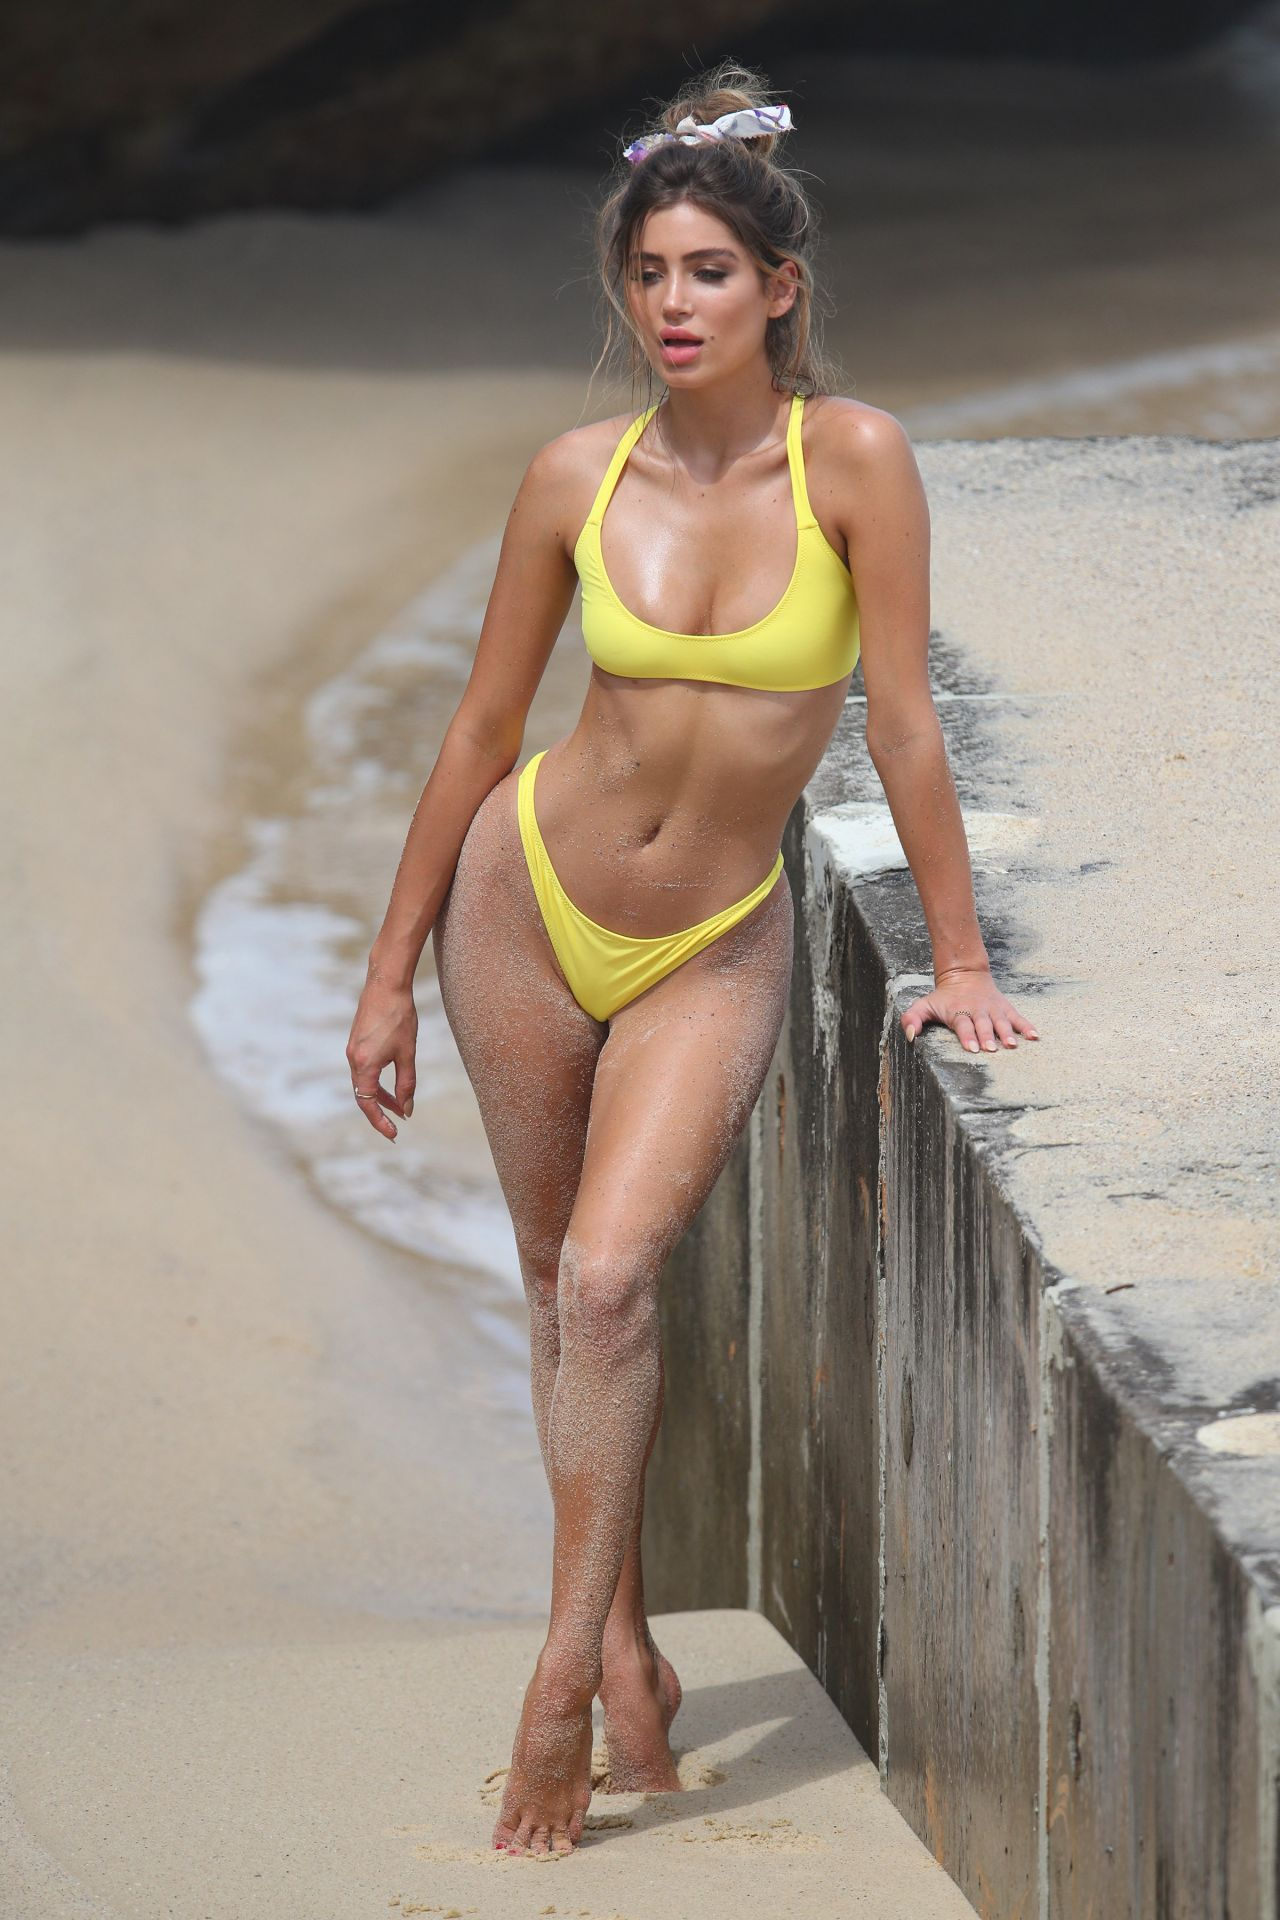 Bella Lucia Bikini Photoshoot on Bronte Beach Pic 4 of 35